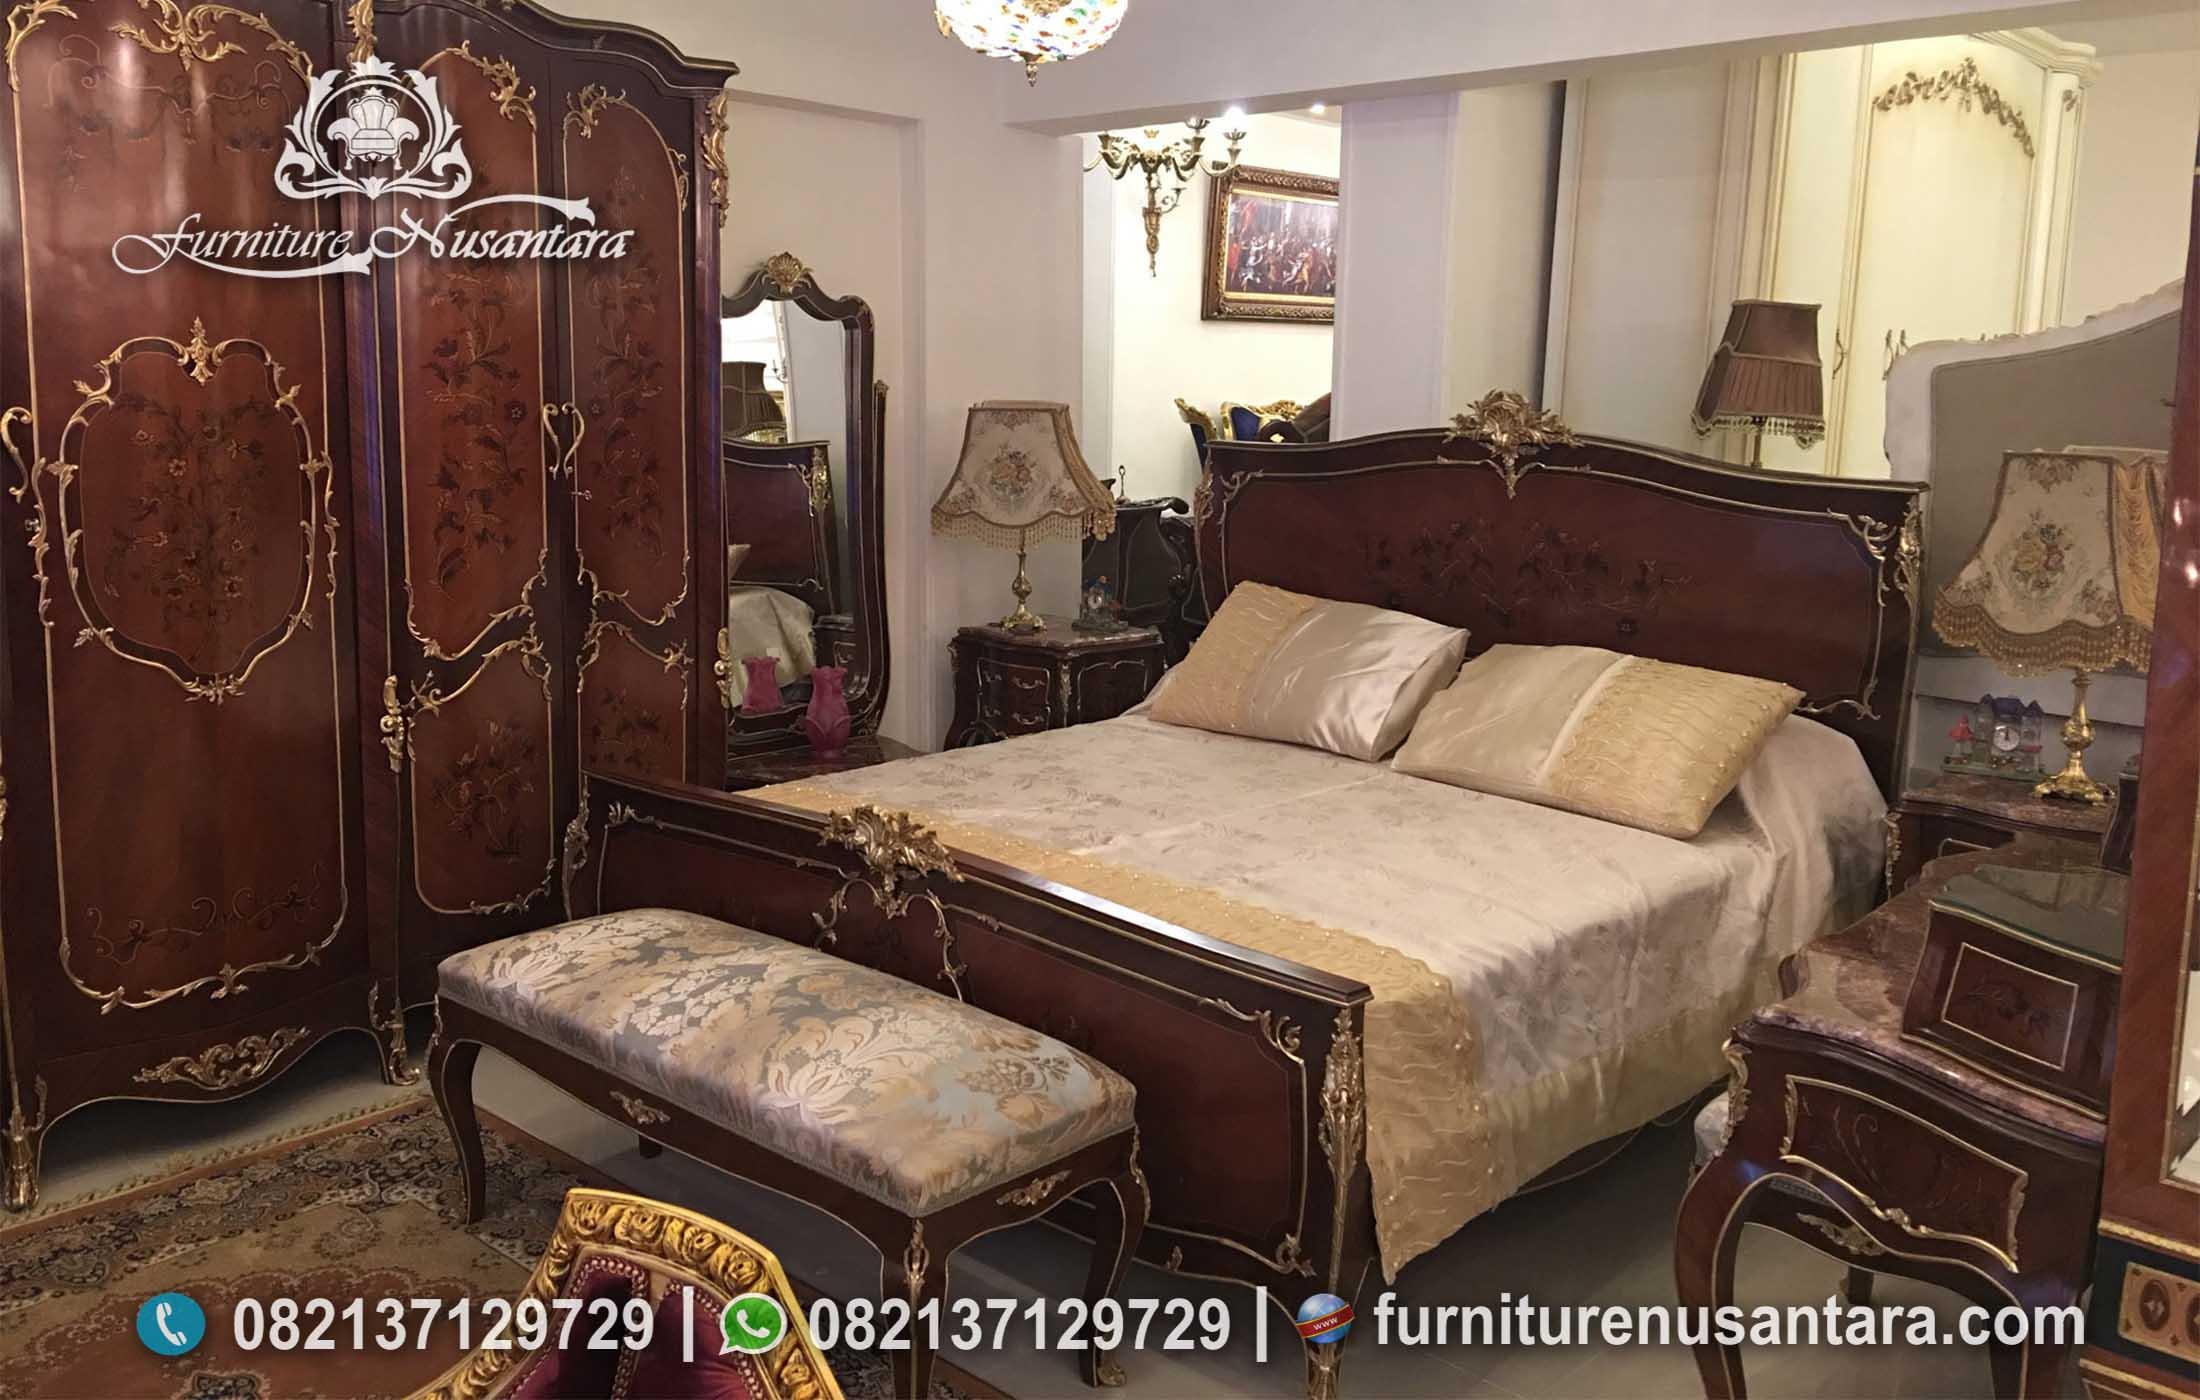 Set Tempat Tidur Antik Sederhana KS-229, Furniture Nusantara